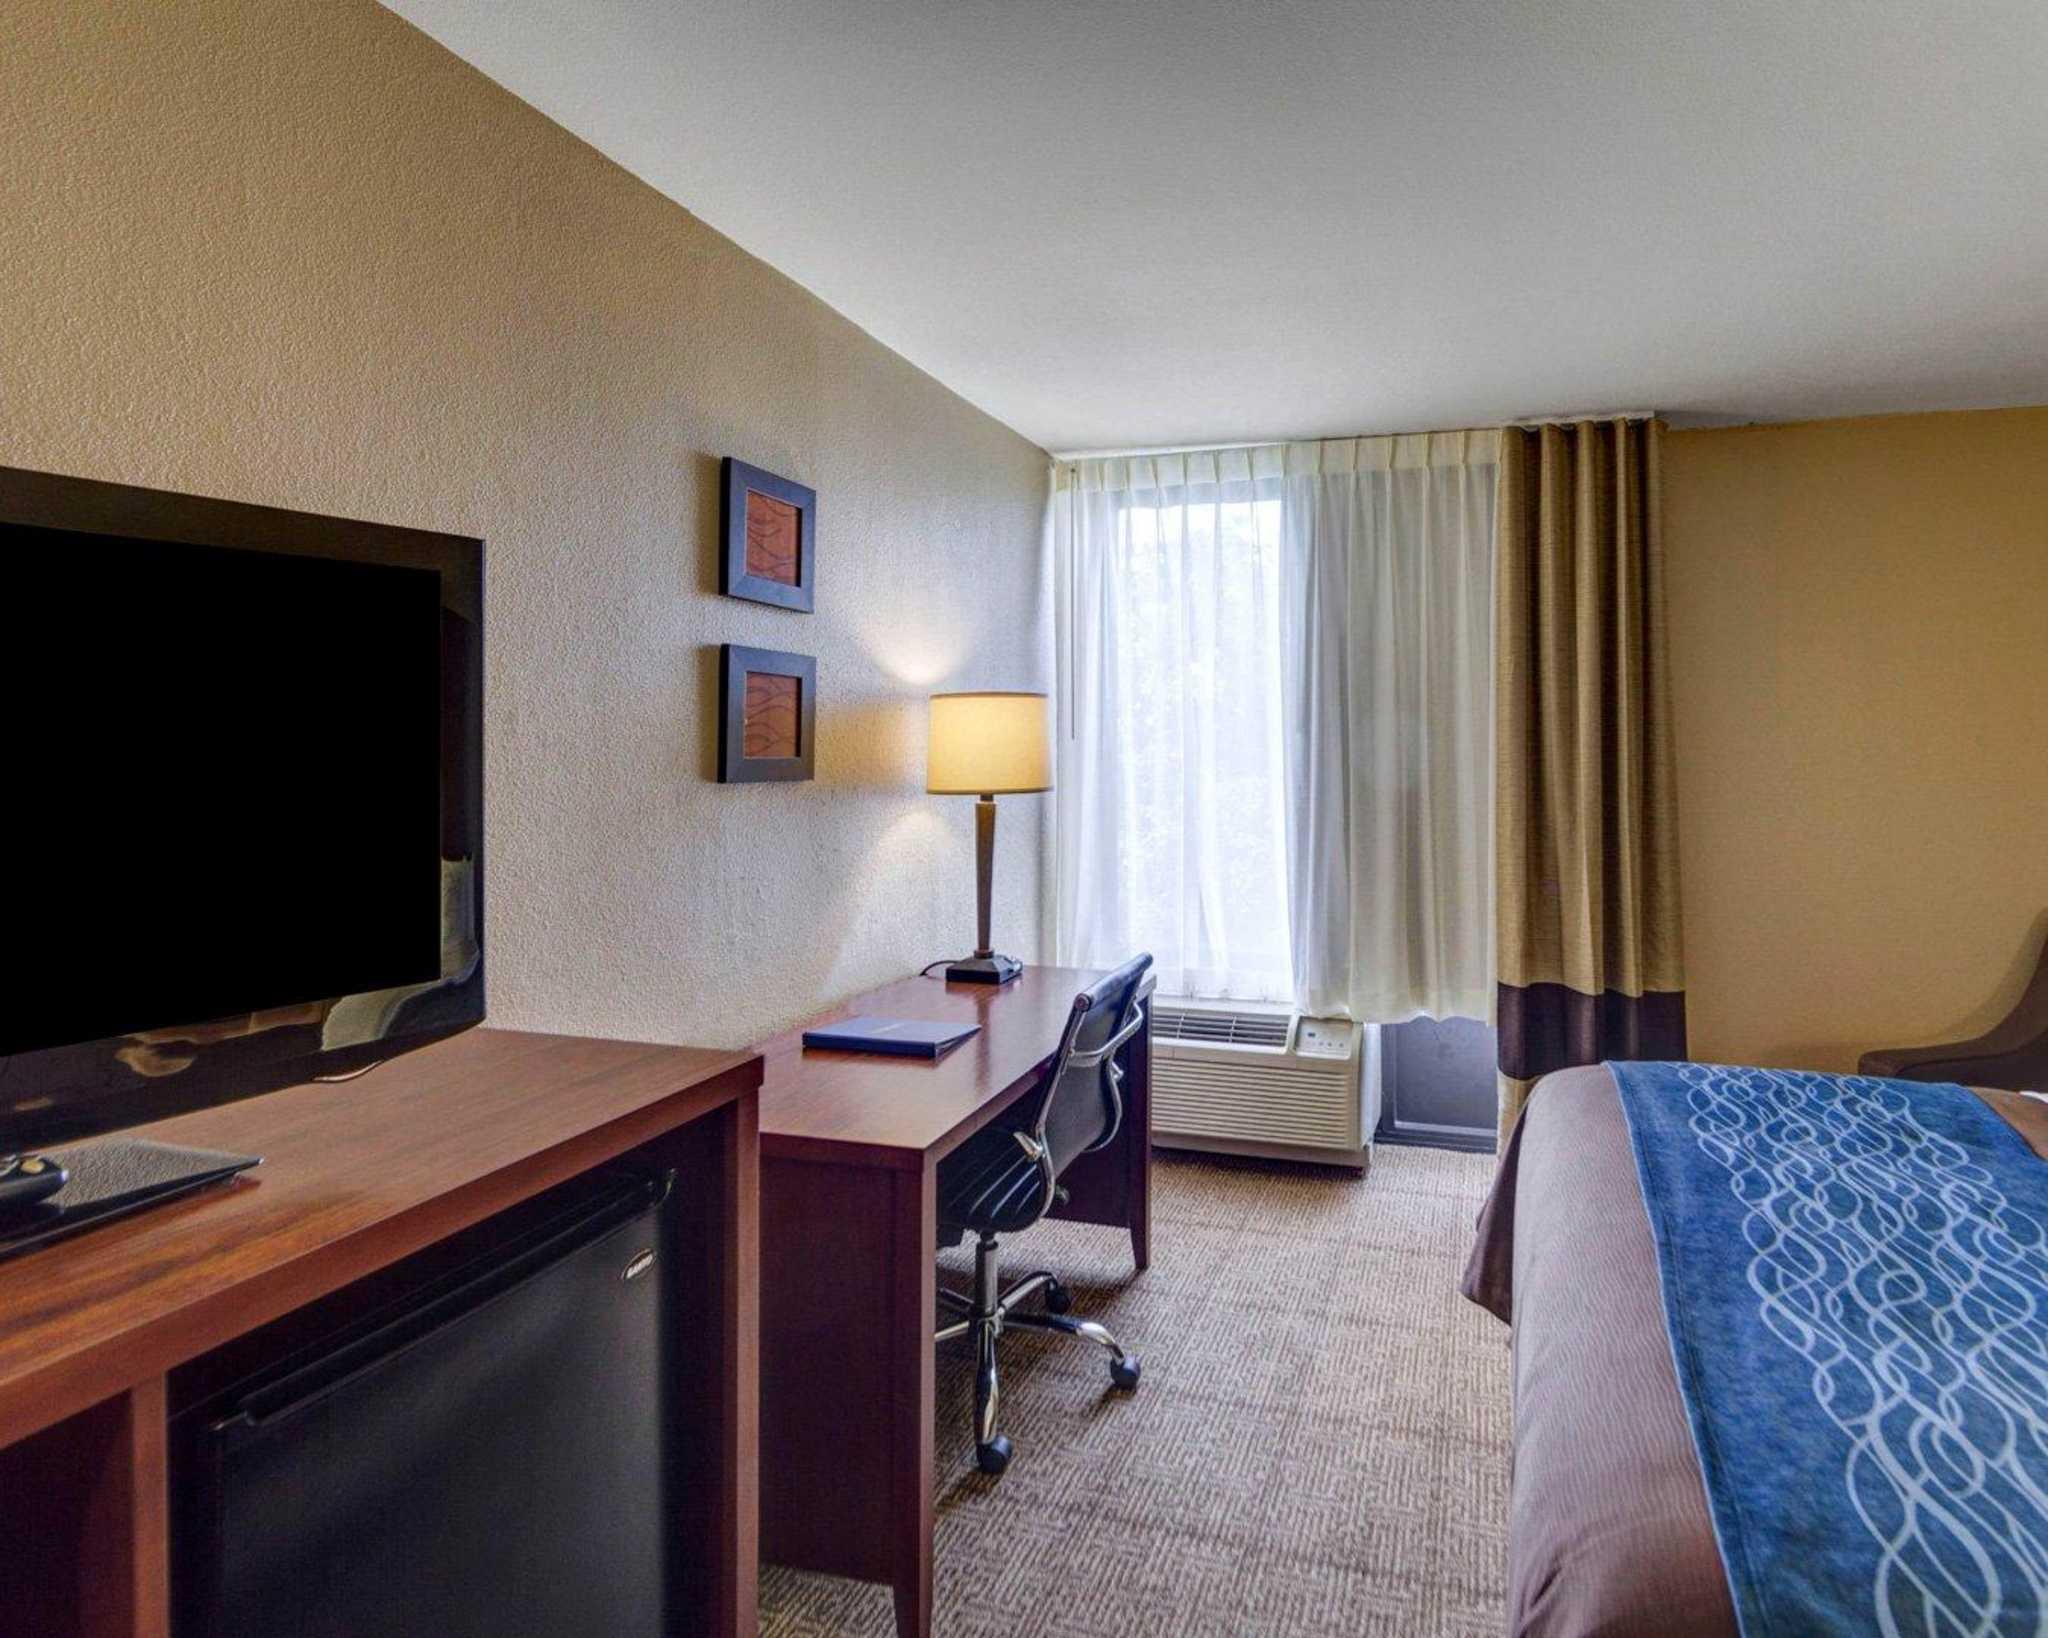 Comfort Inn & Suites Plano East image 9